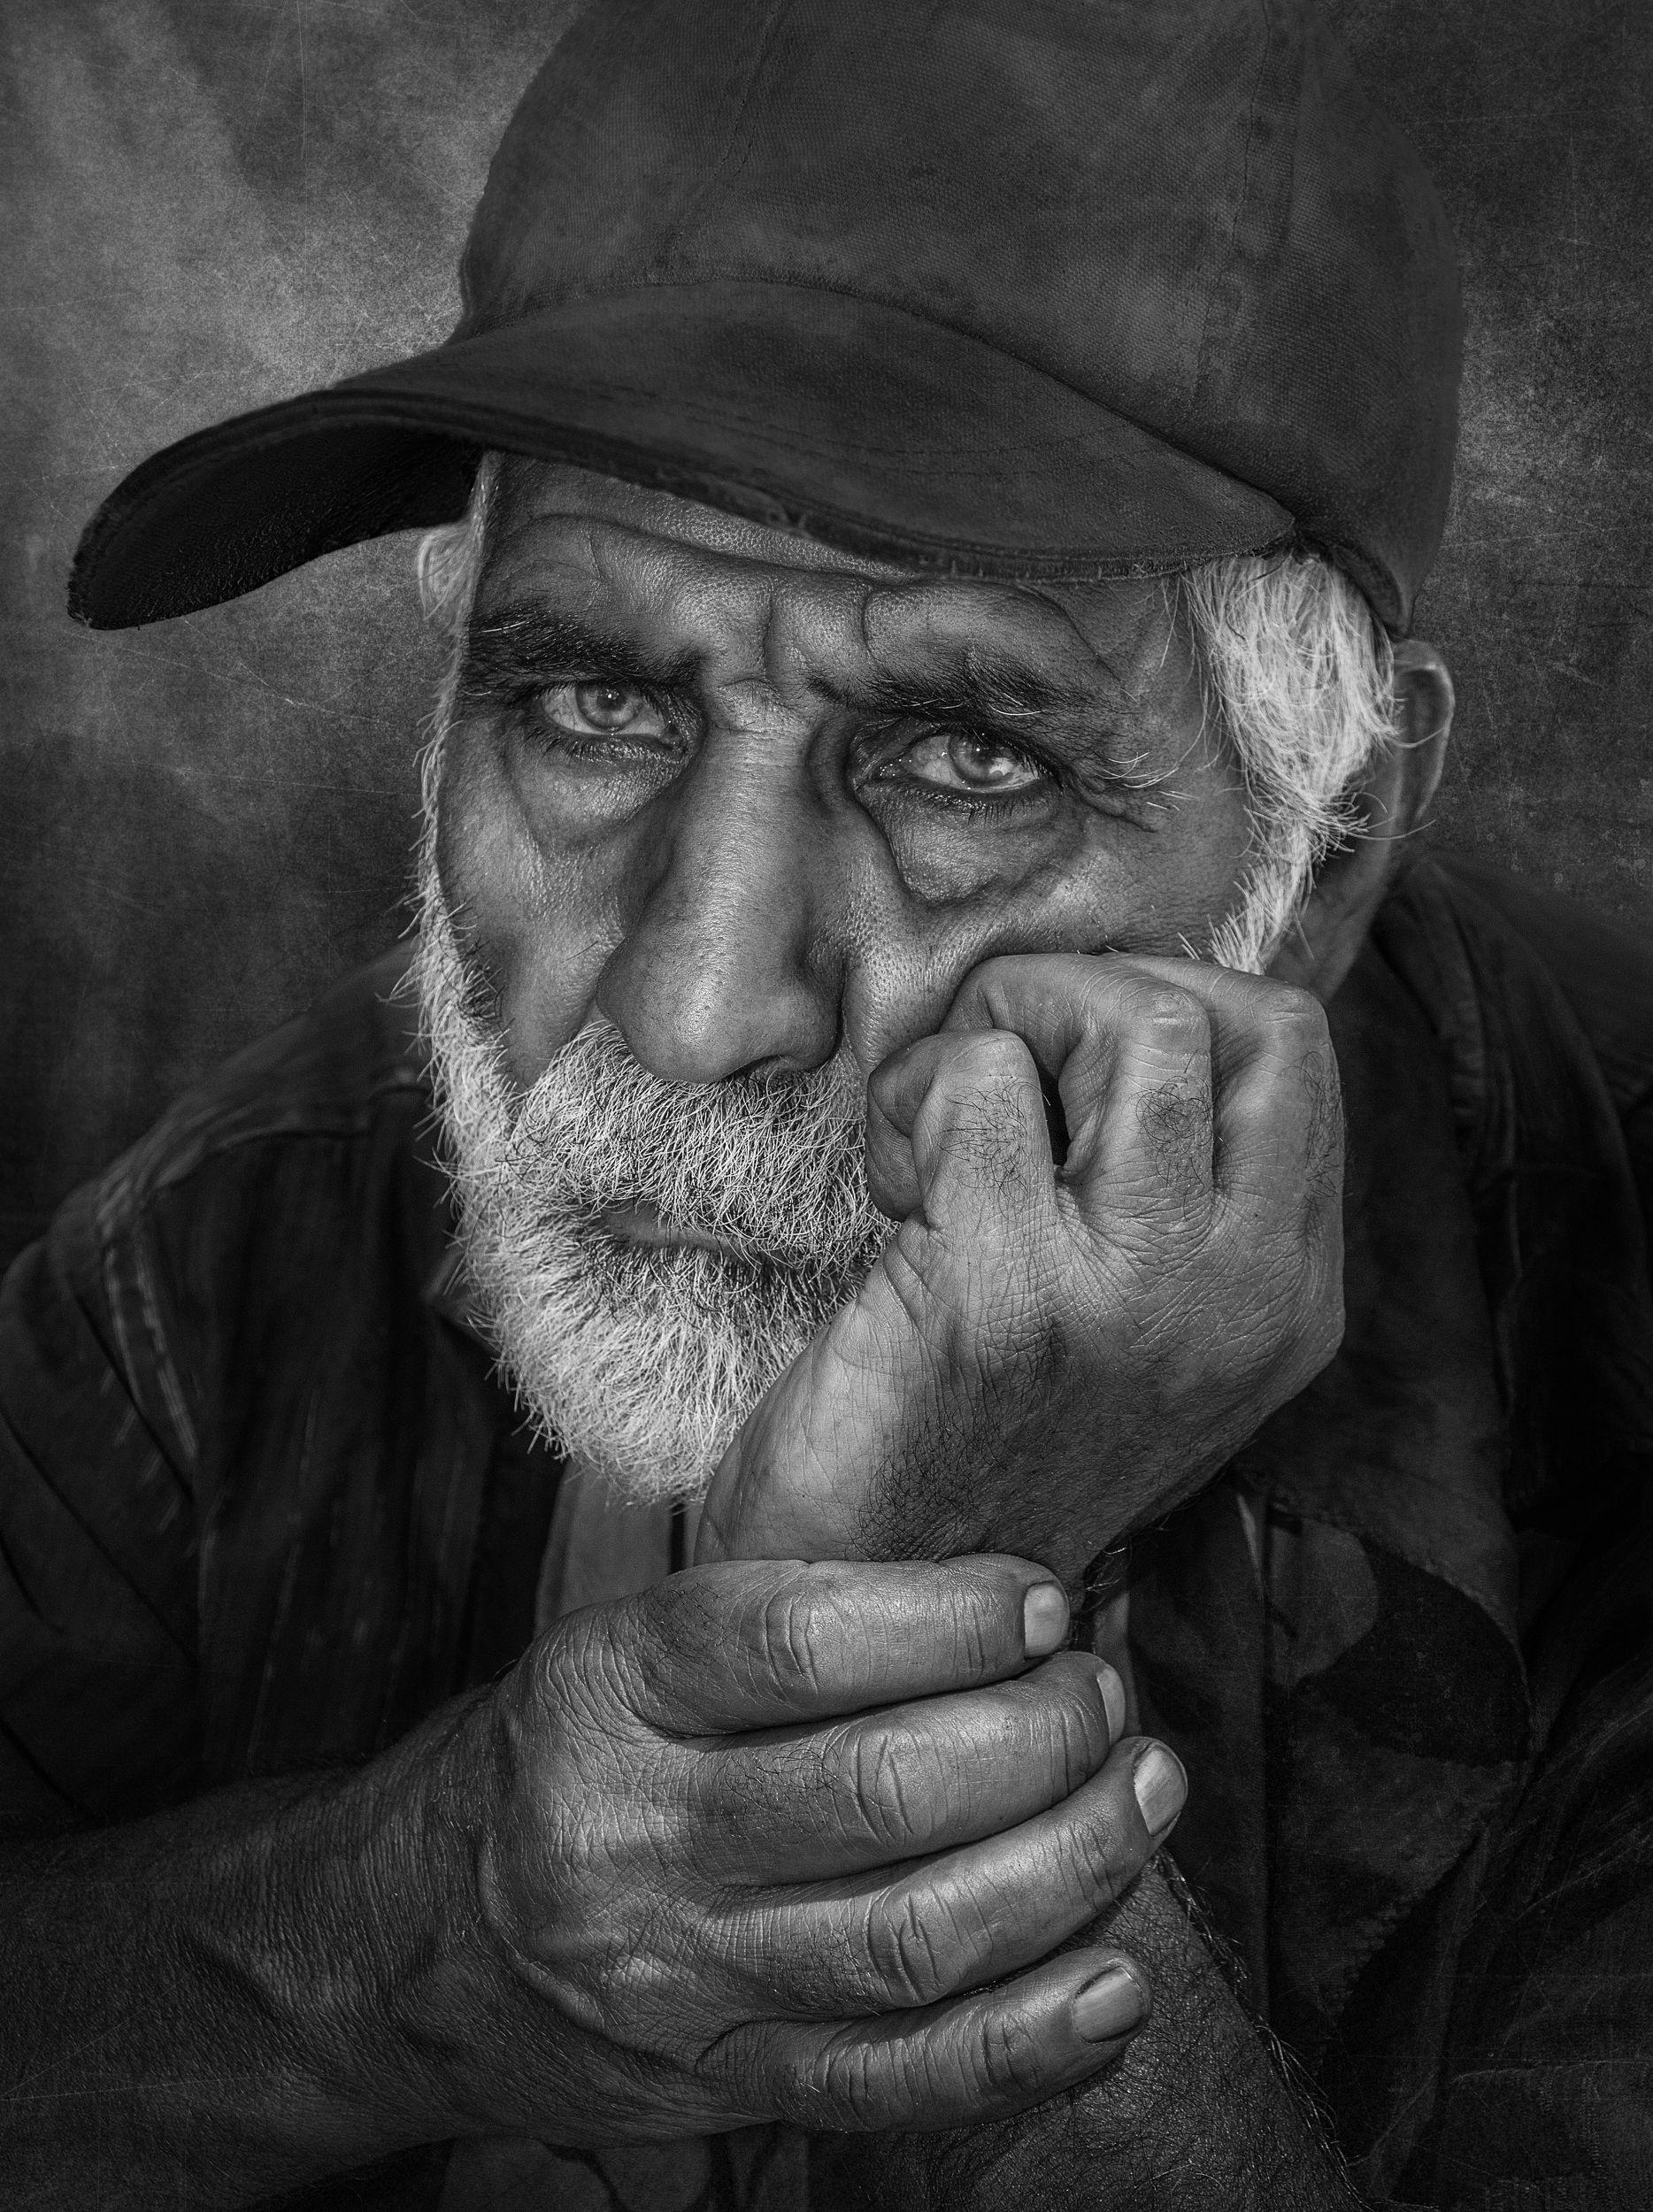 #PORTRAIT #people #human #hand #eye, Zavvar Mehdi